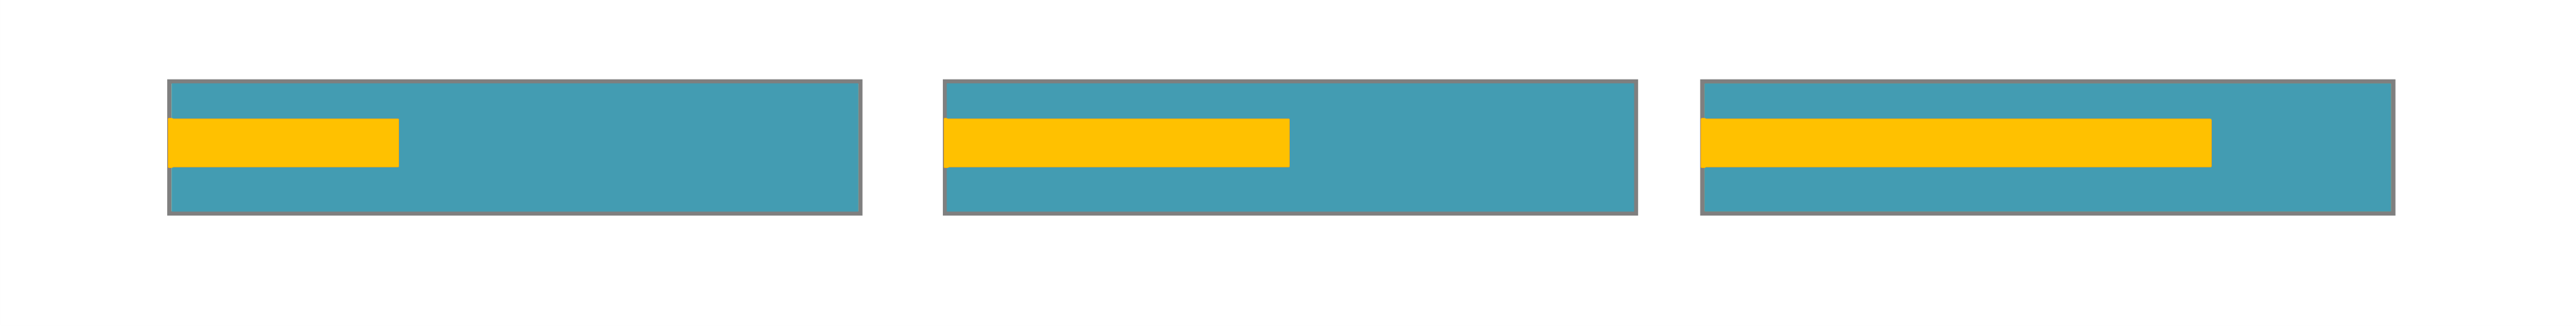 VARCHART XGantt: Progress bars in Gantt charts